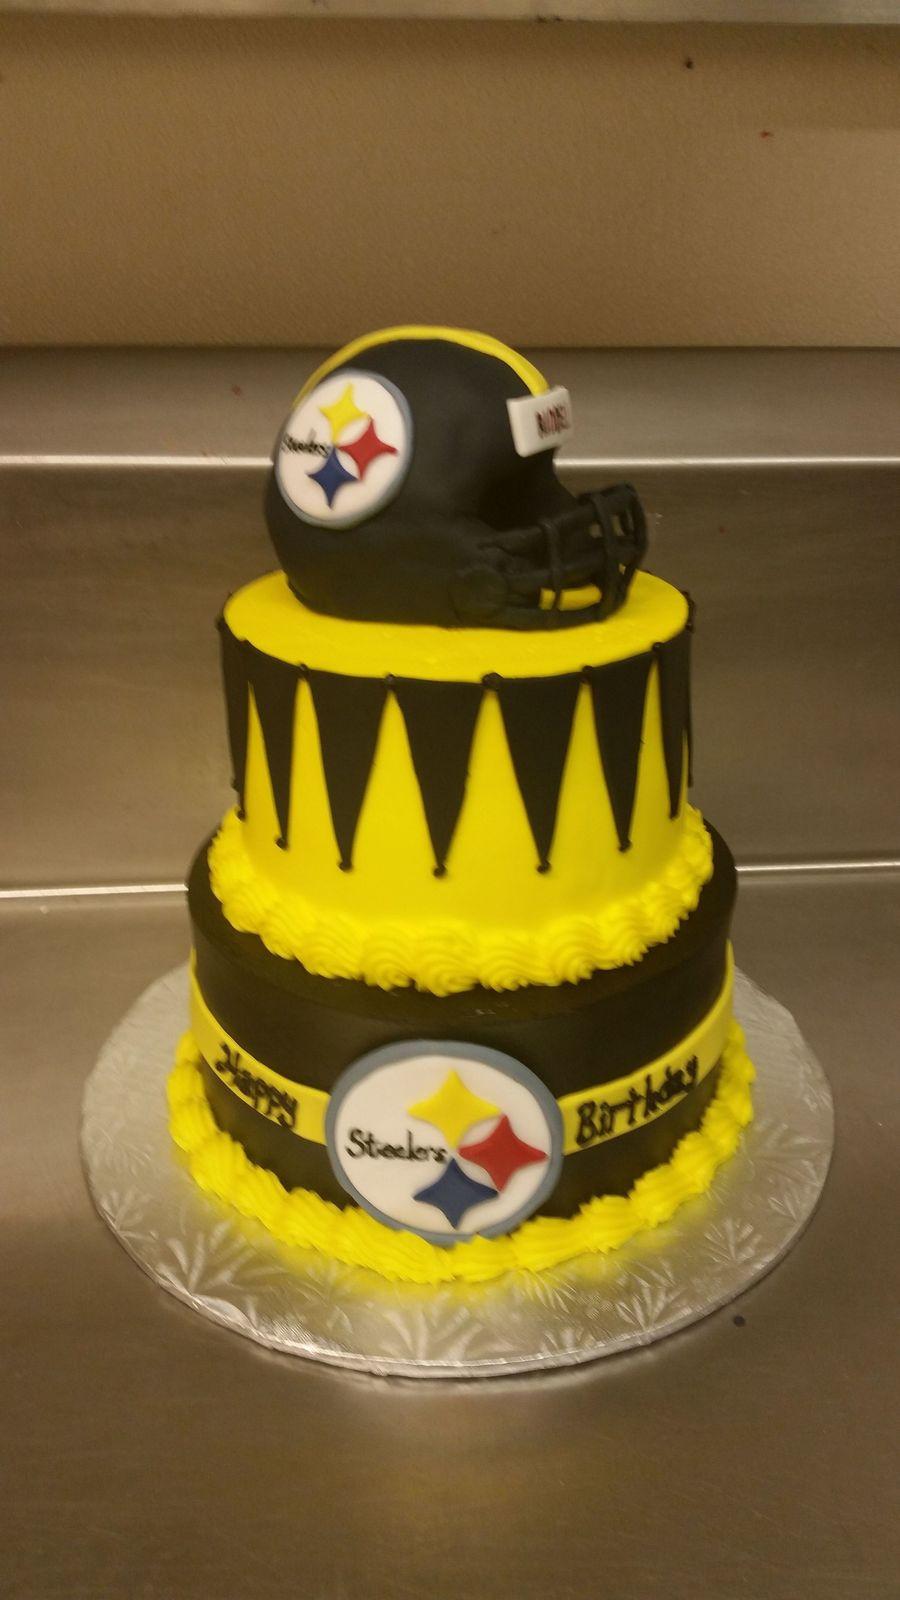 Steelers birthday cake, fondant covered rice krispie helmet. The cake ...